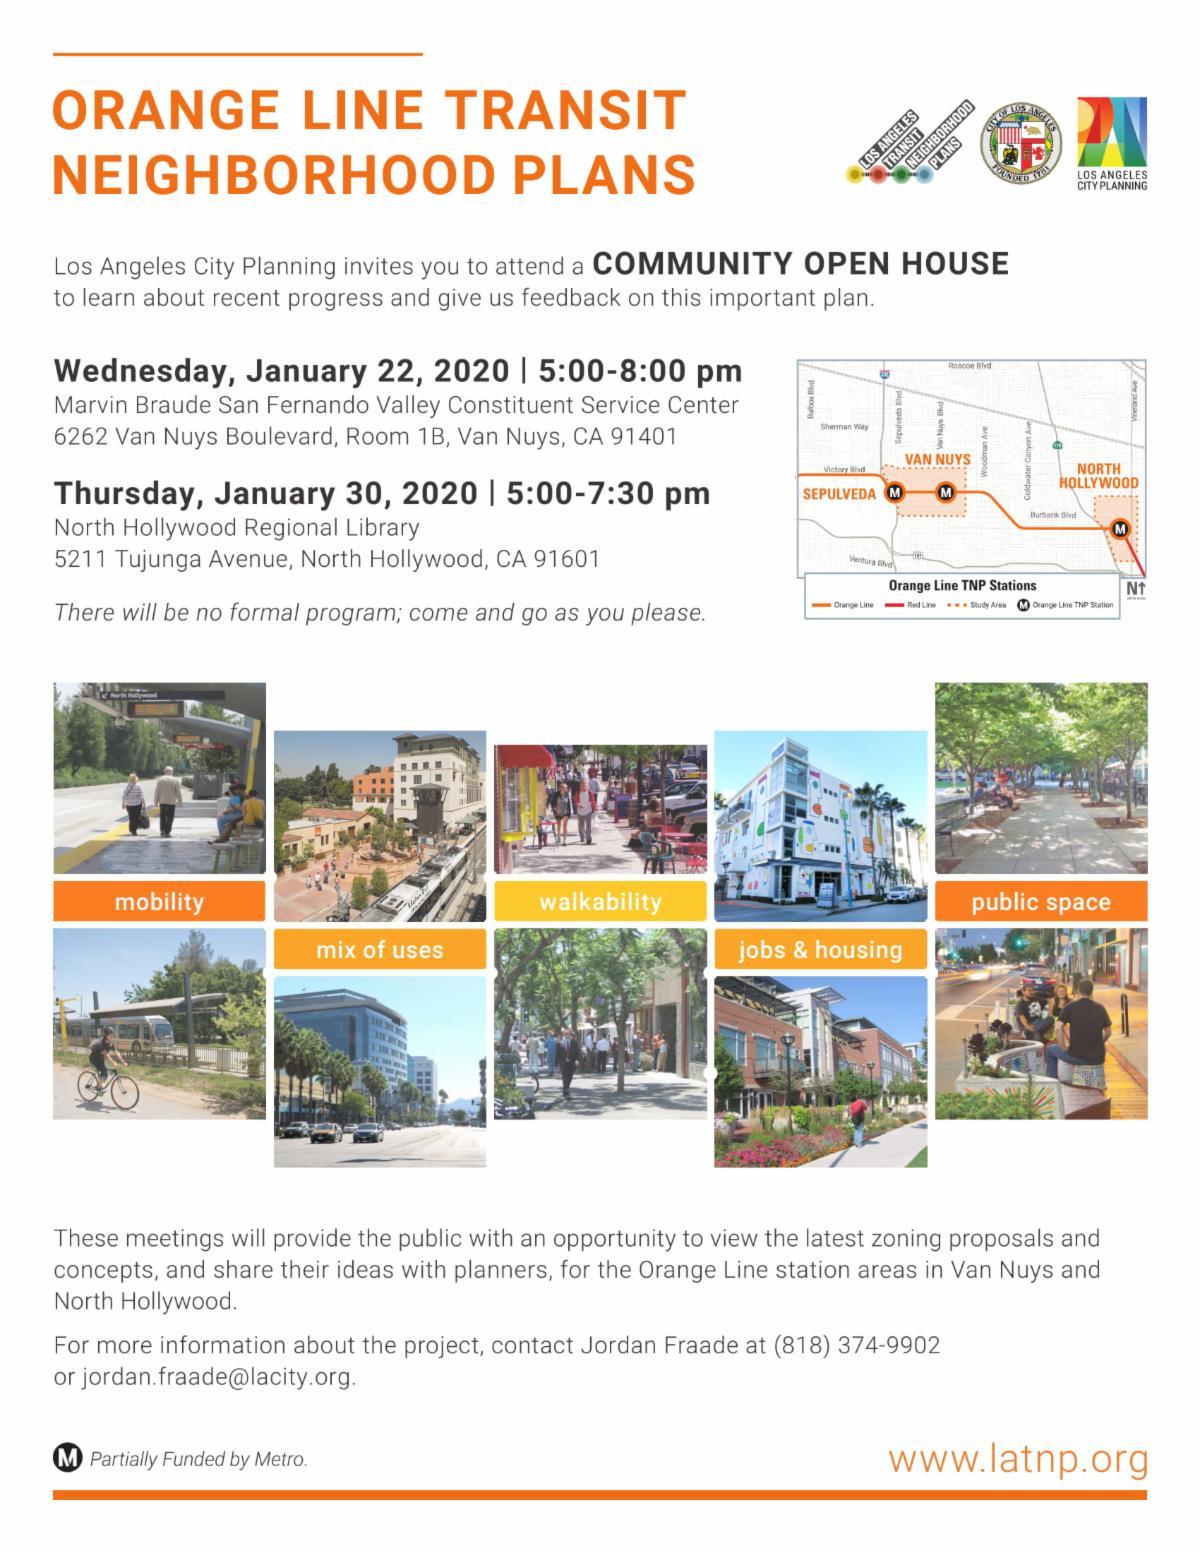 Orange Line Transit Neighborhood Plans Community Meetings